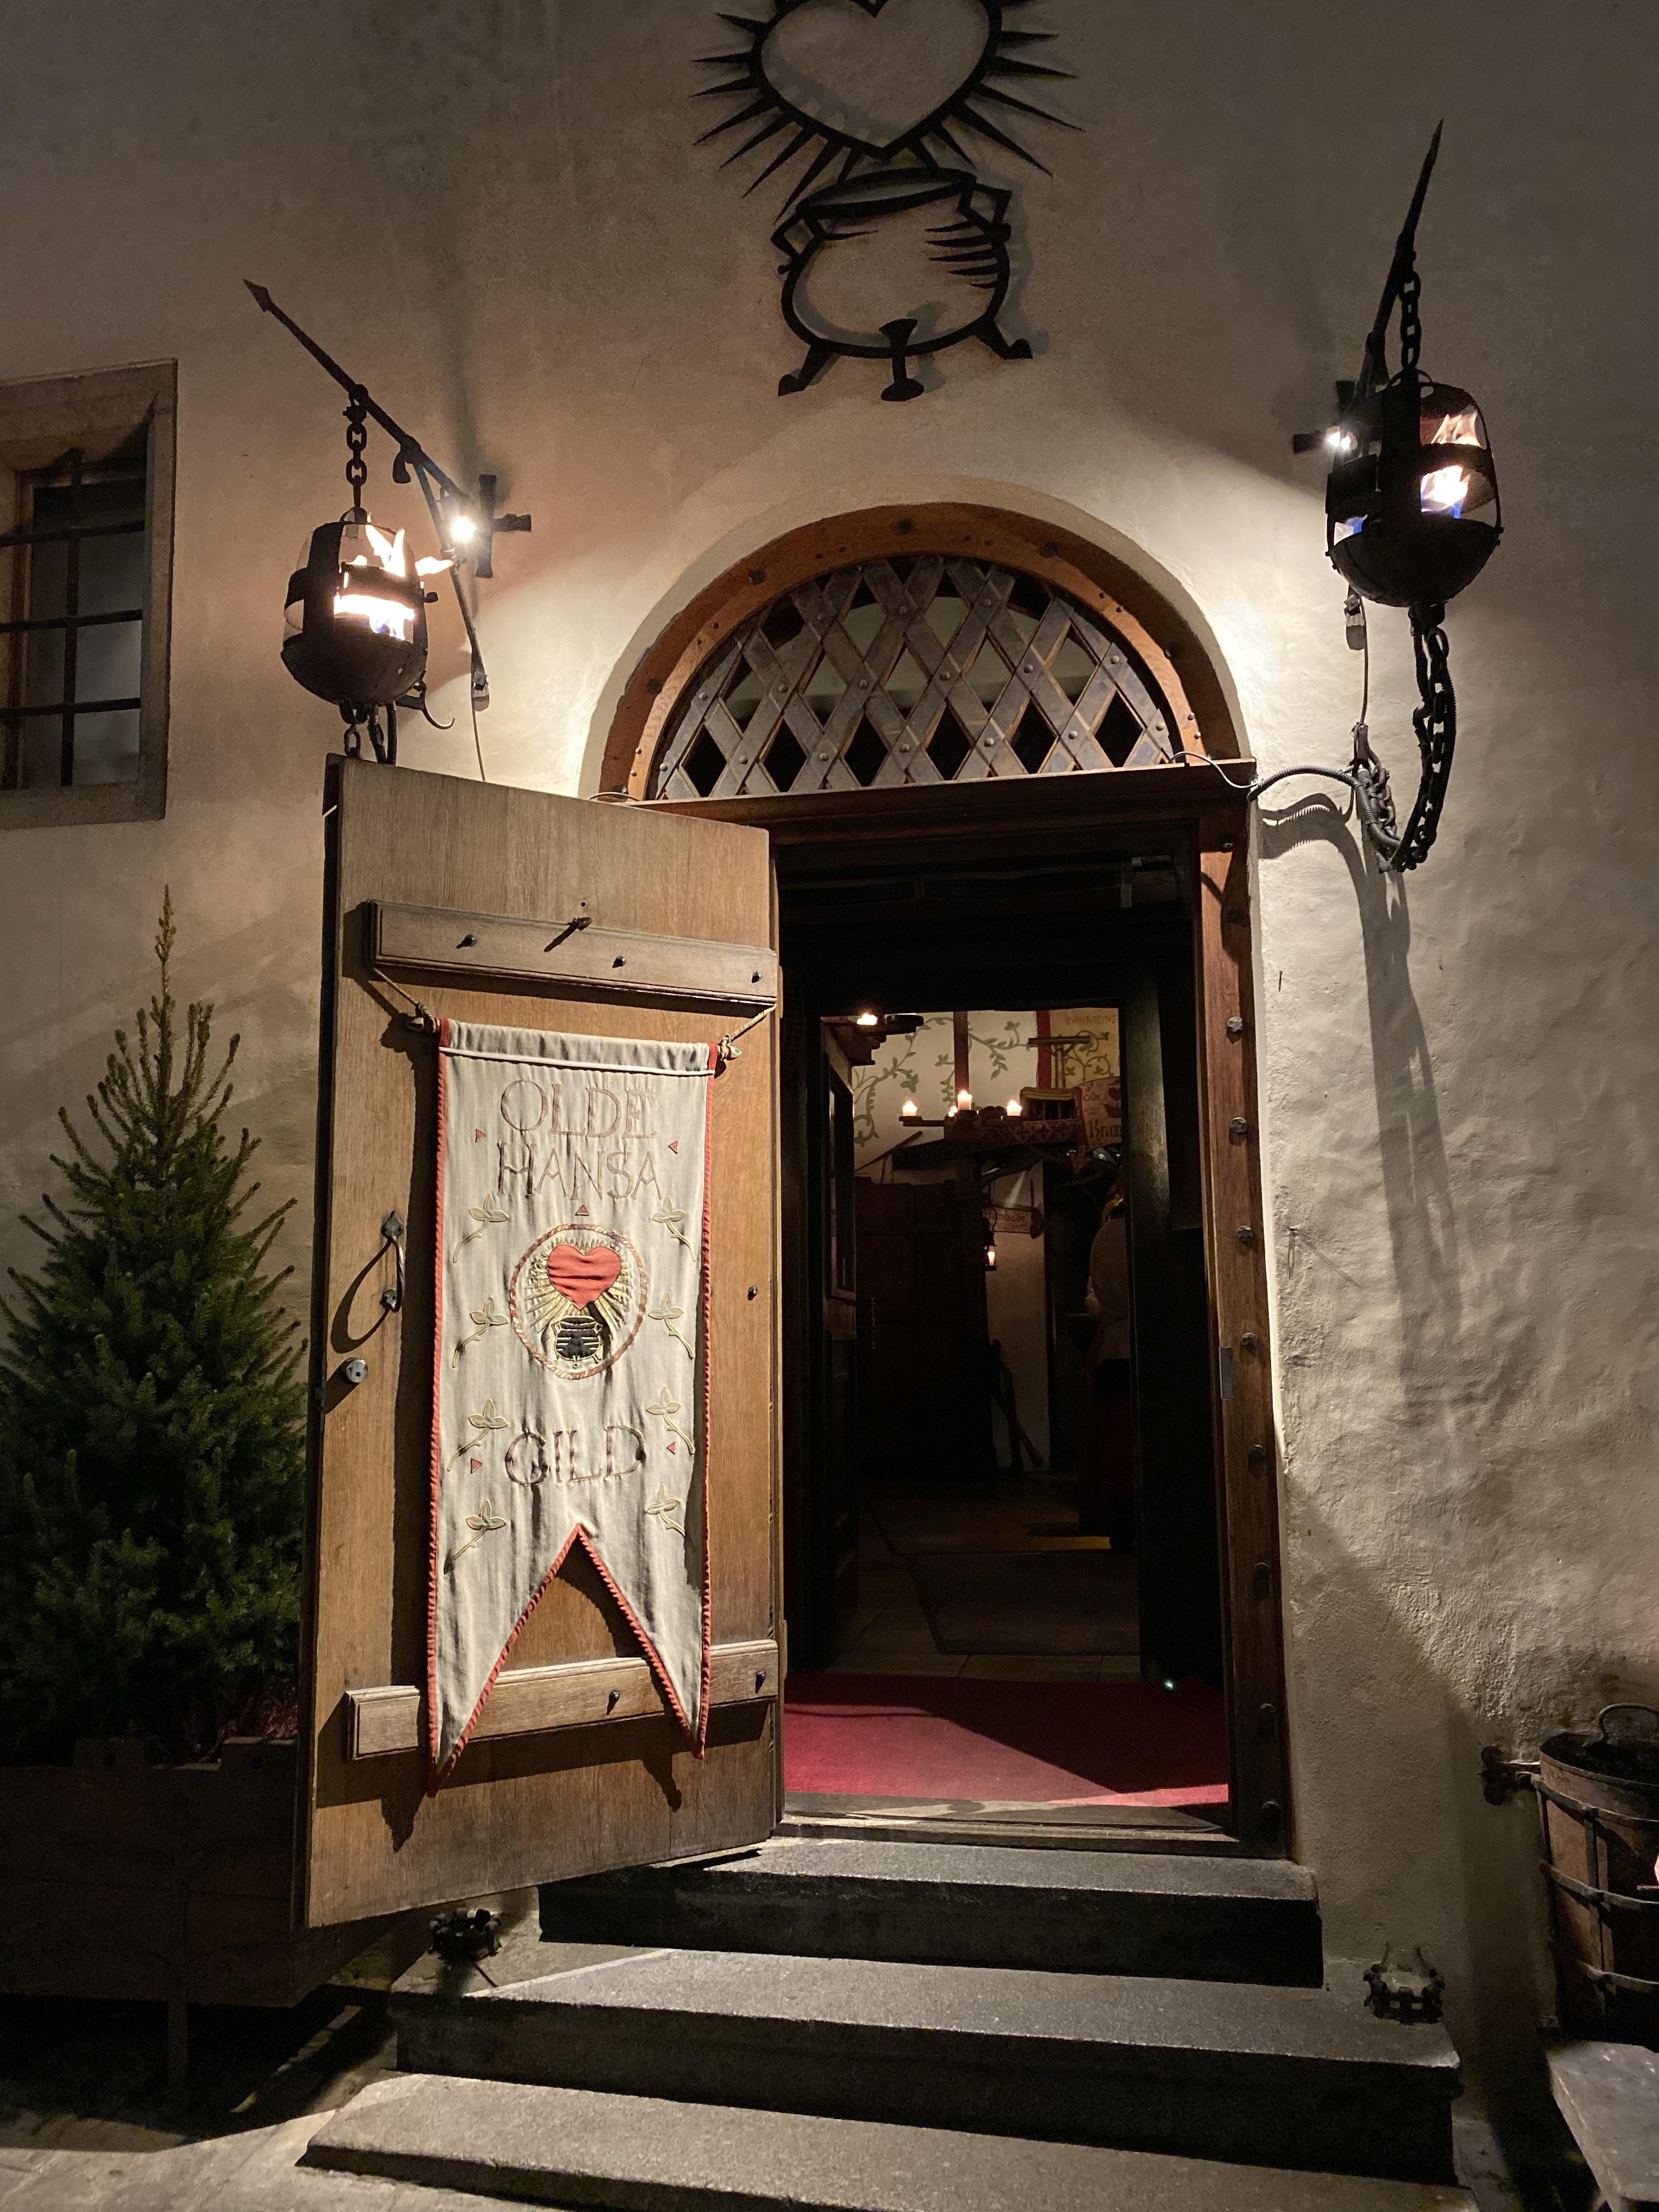 The entrance to Olde Hansa medieval restaurant in Tallinn, Estonia.